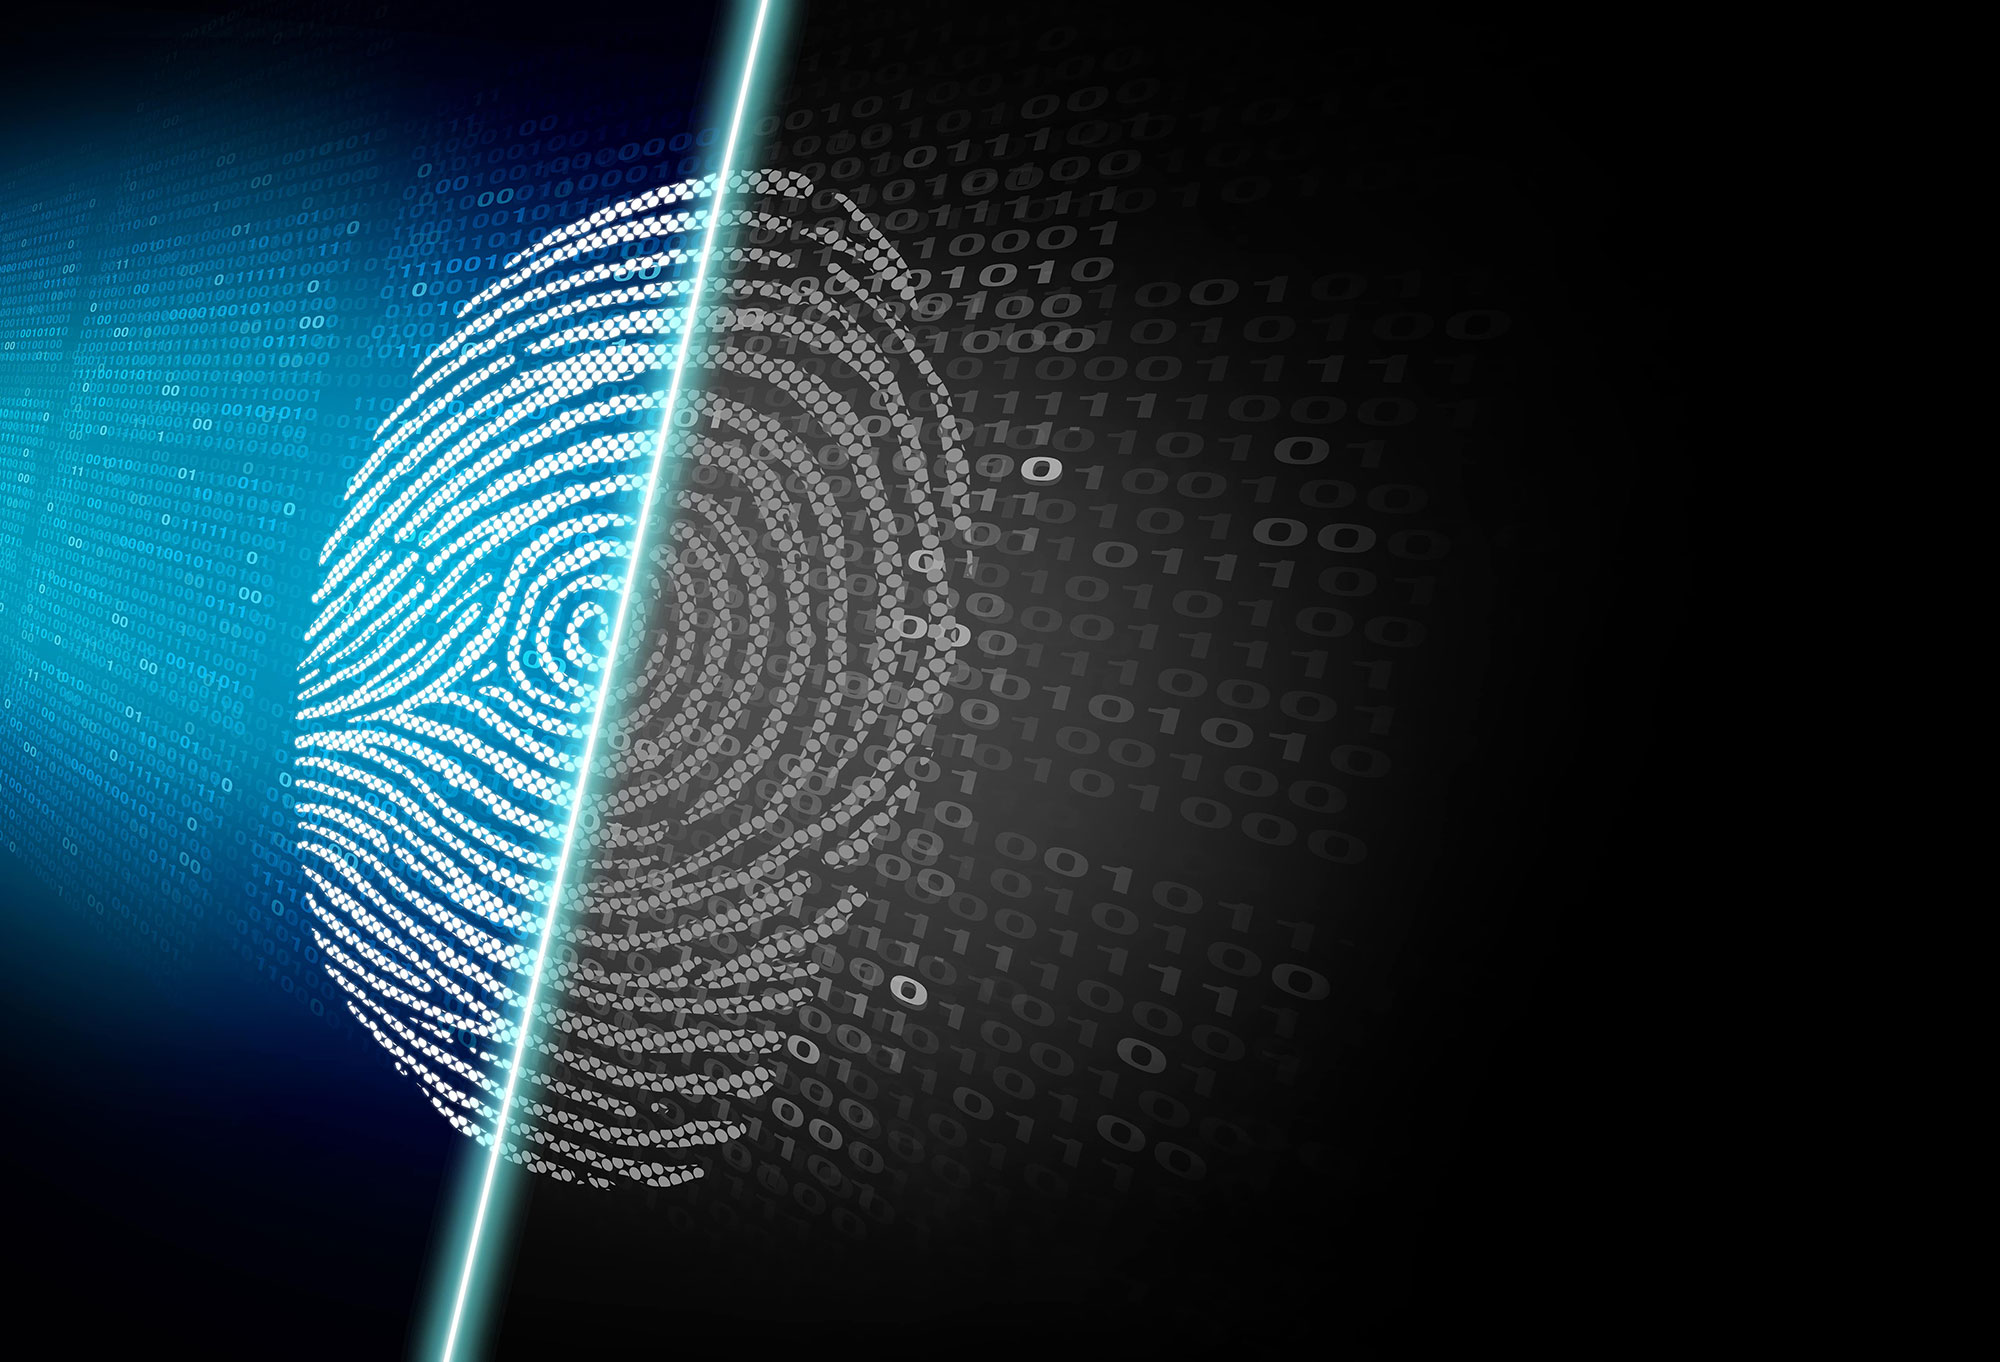 Digitaal forensisch onderzoek / Digital forensic investigation